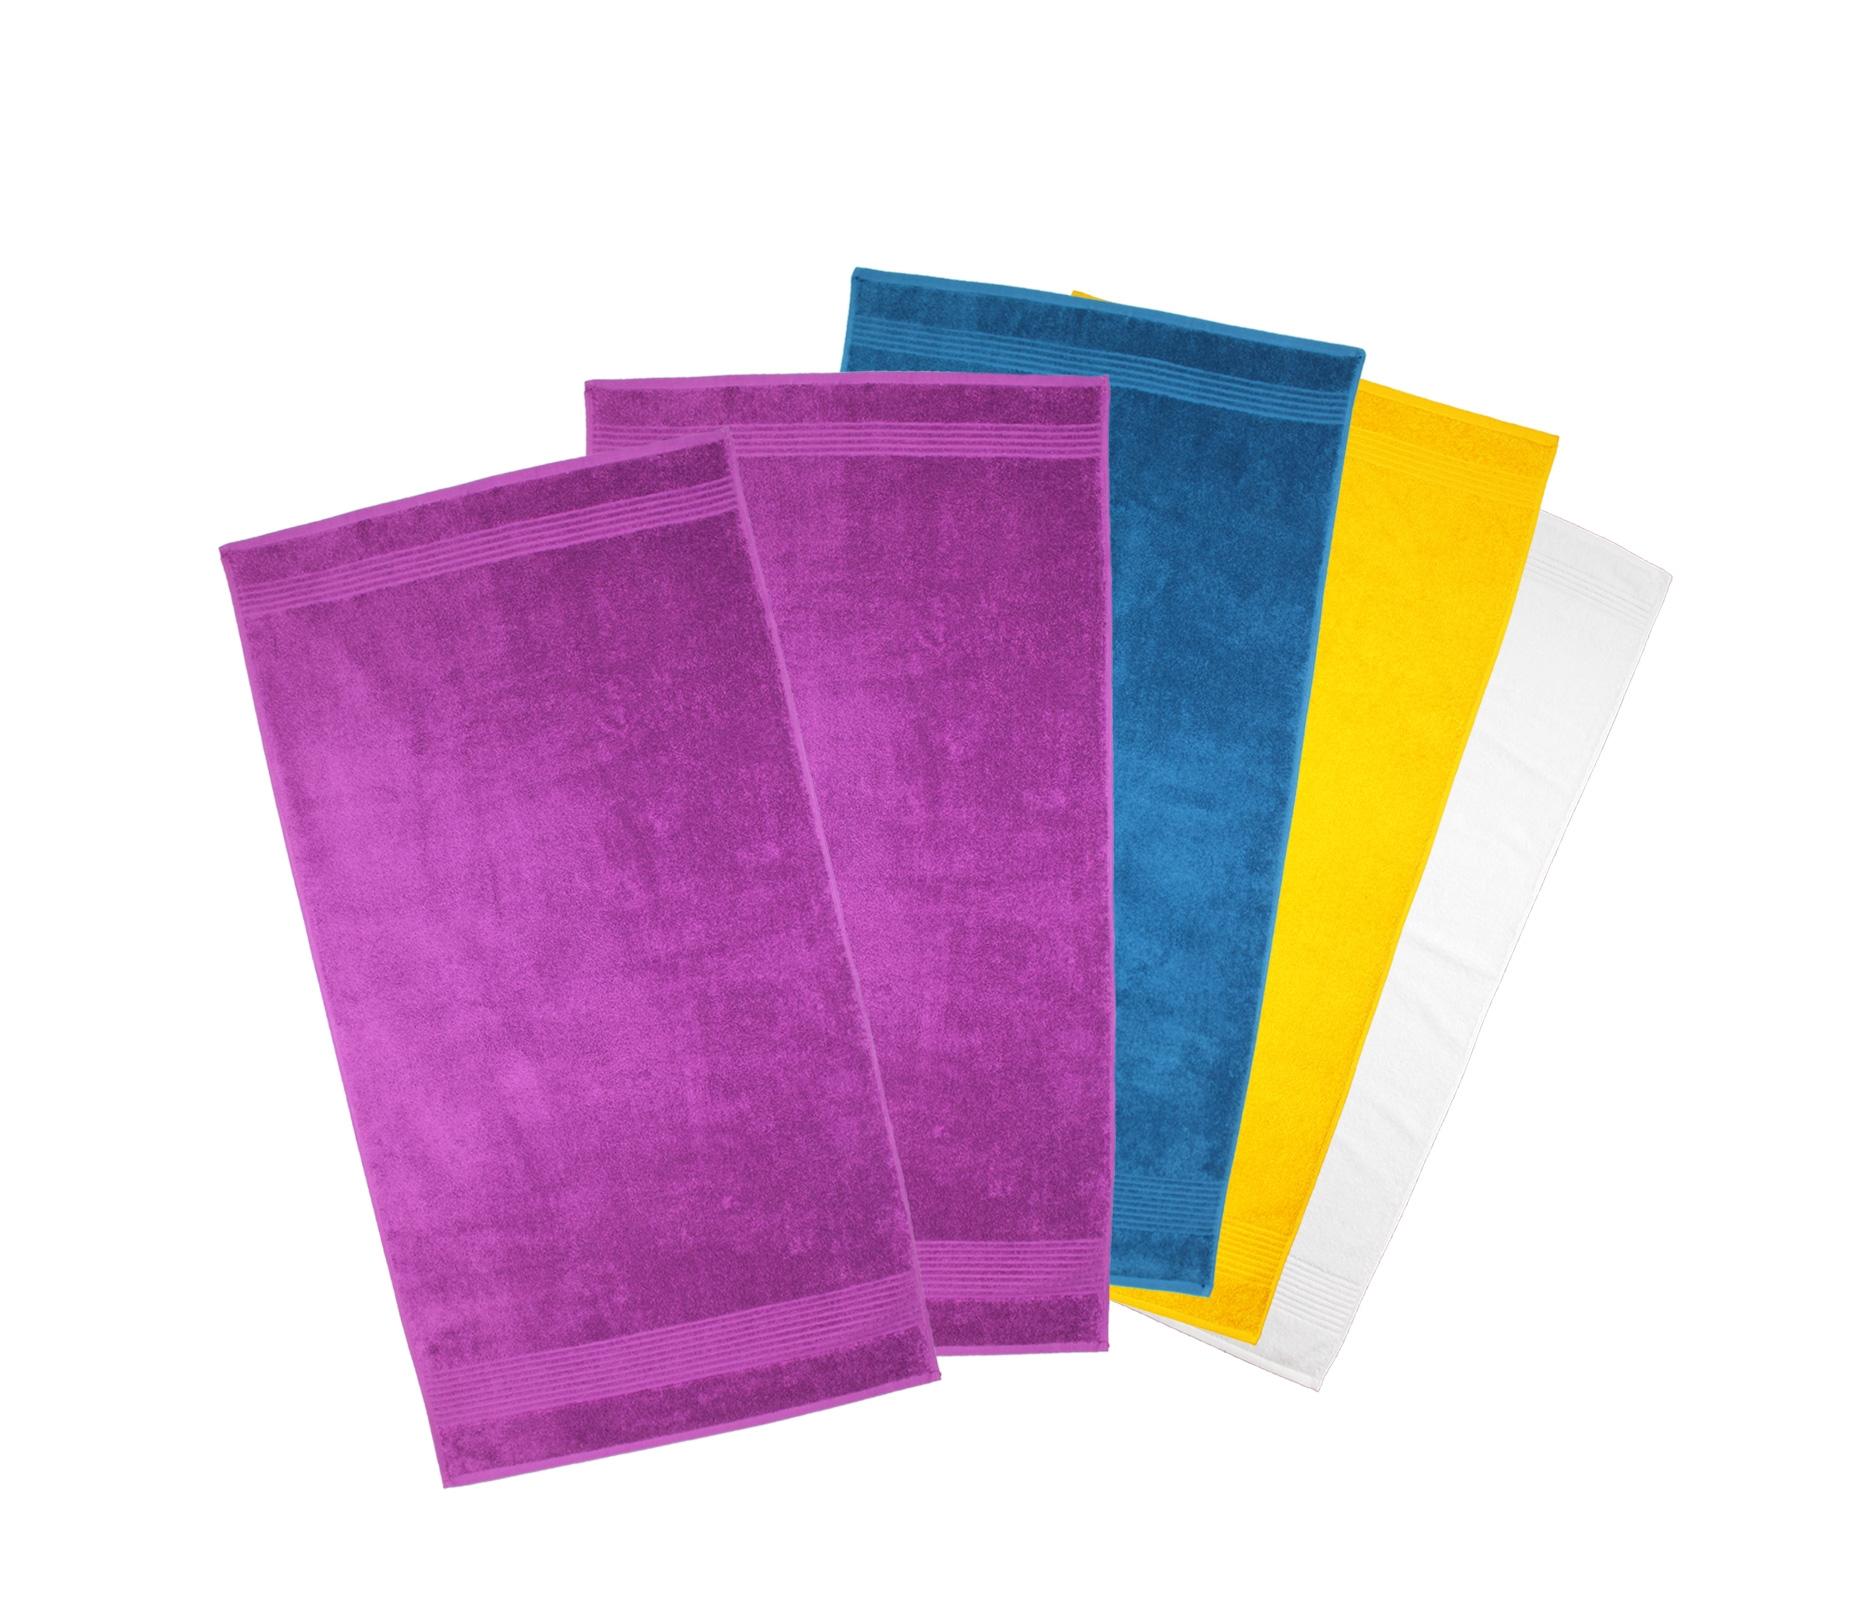 Badtextilien - 2er Set Handtuch Svilanit quick dry 50x100 cm 500g m²  - Onlineshop PremiumShop321